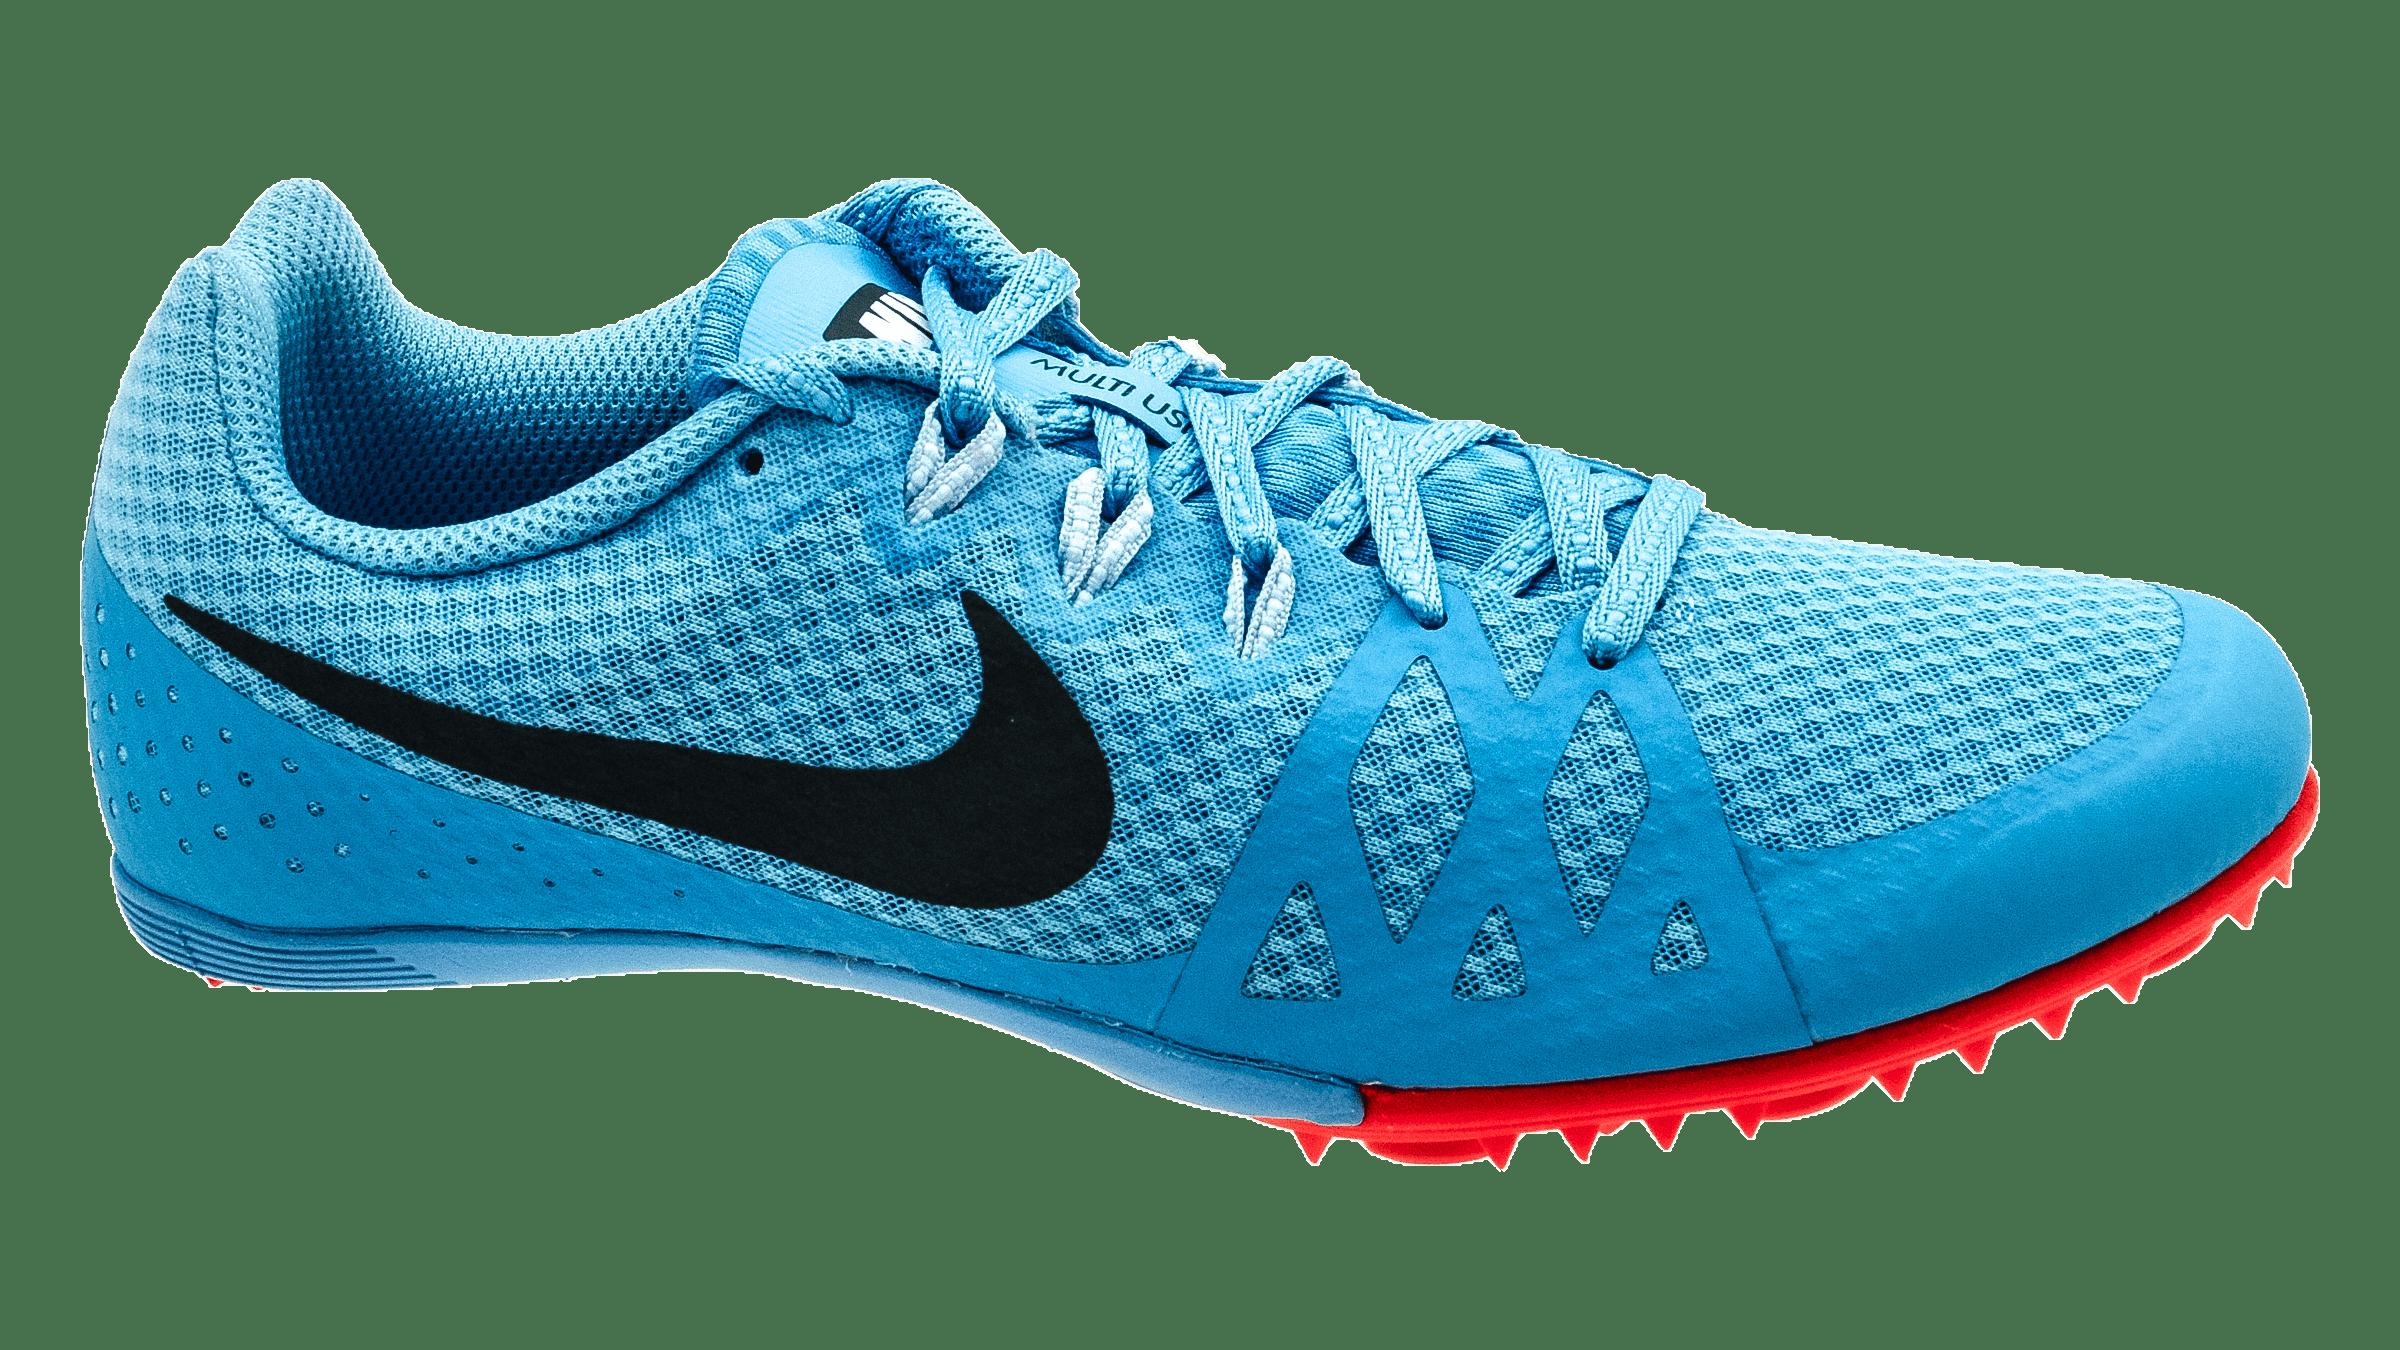 the best attitude b5061 40f79 Nike Zoom Rival M8 spikes royal-bluegreen-glow unisex bestellen bij  Skate-dump.nl